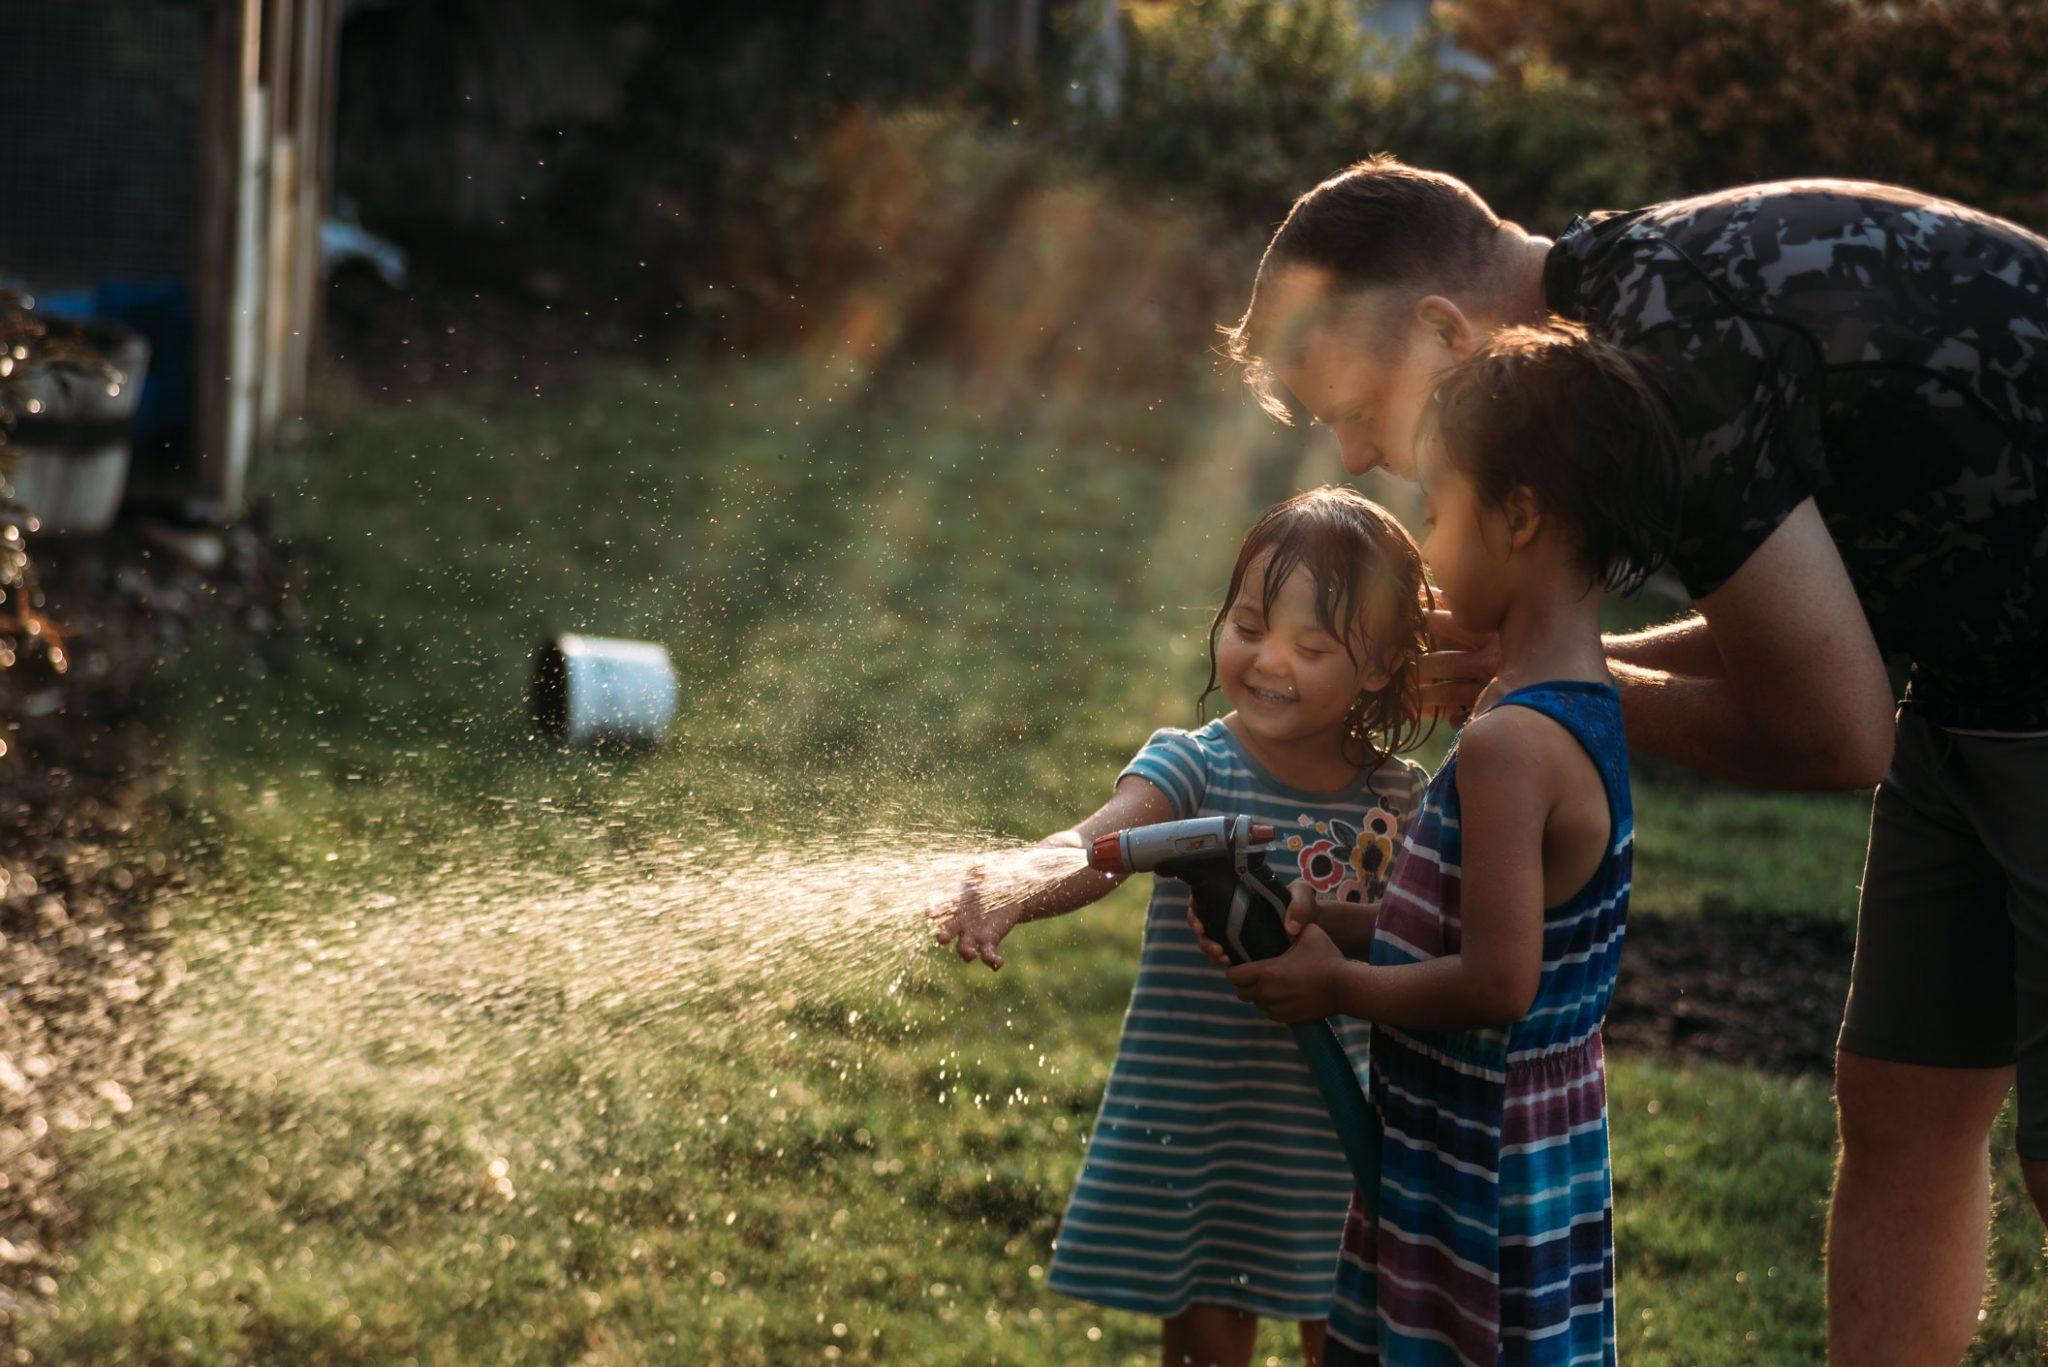 Last Days of Summer 2018 | Spokane Photographer